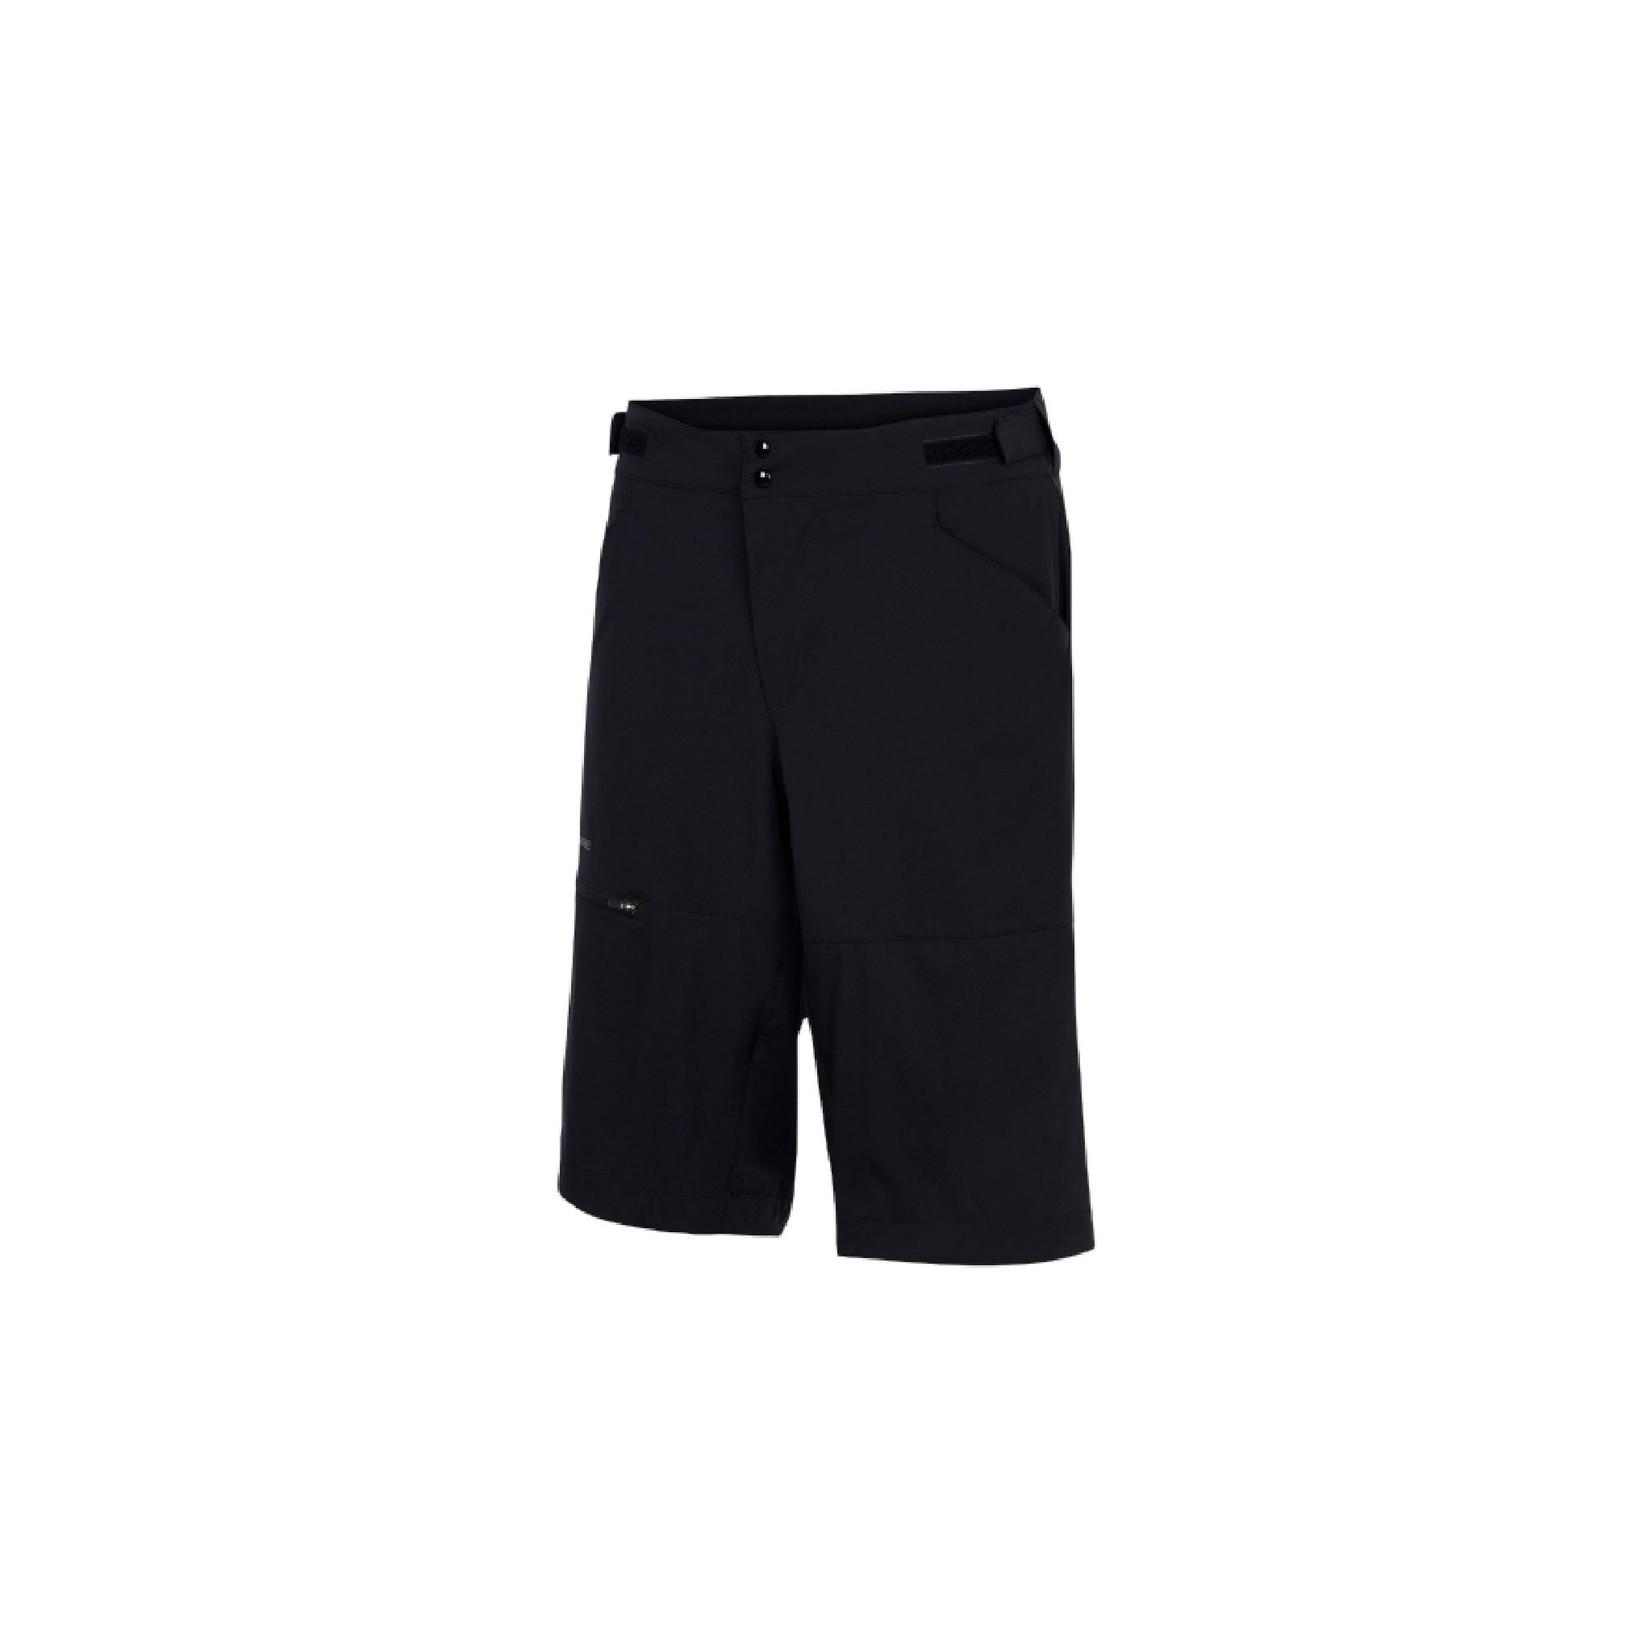 Lapierre Supreme Single Track MTB Shorts Medium Black 2021